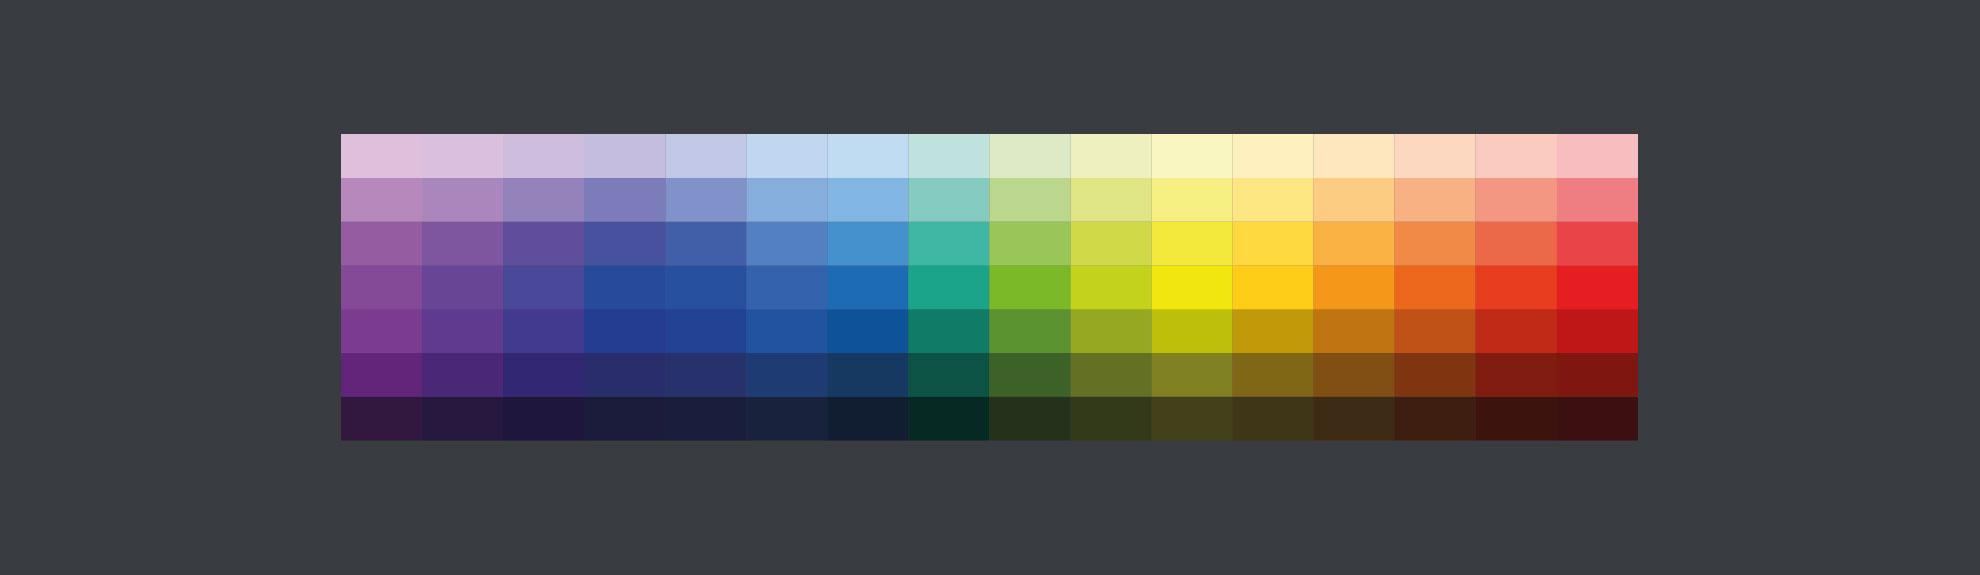 How Colours Affect Your Web Design